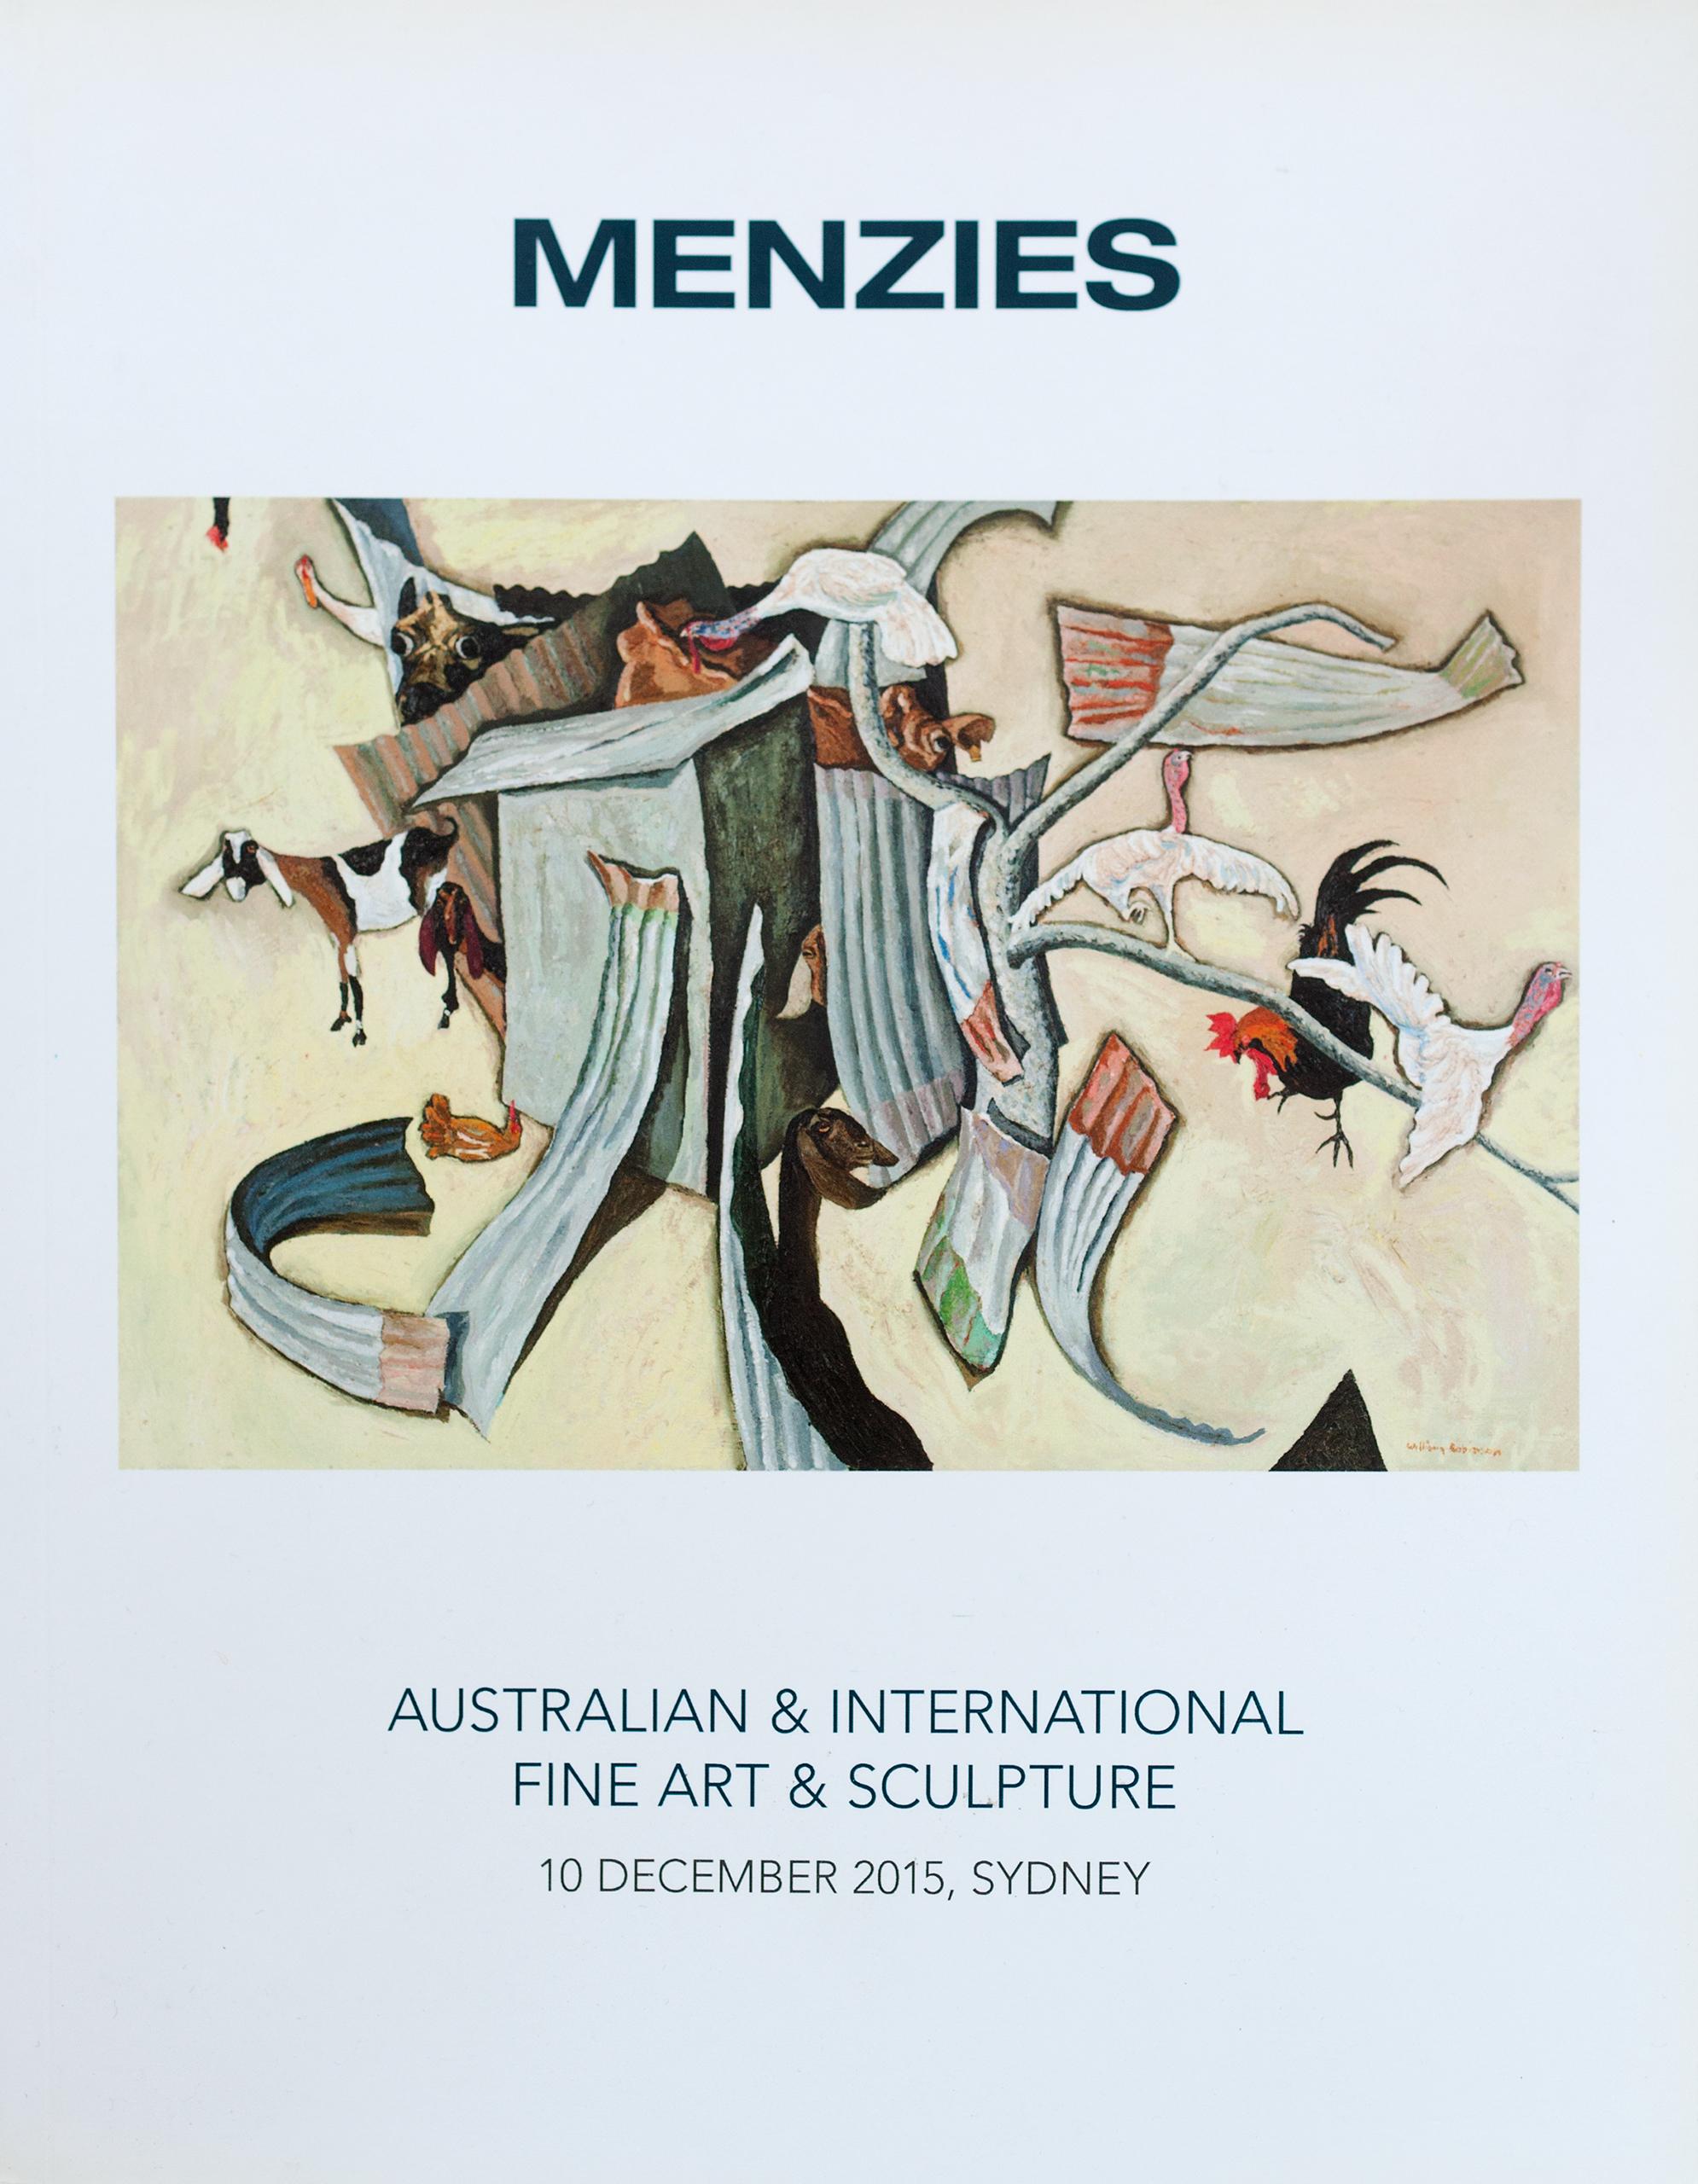 171023 Menzies Catalogues_001.jpg